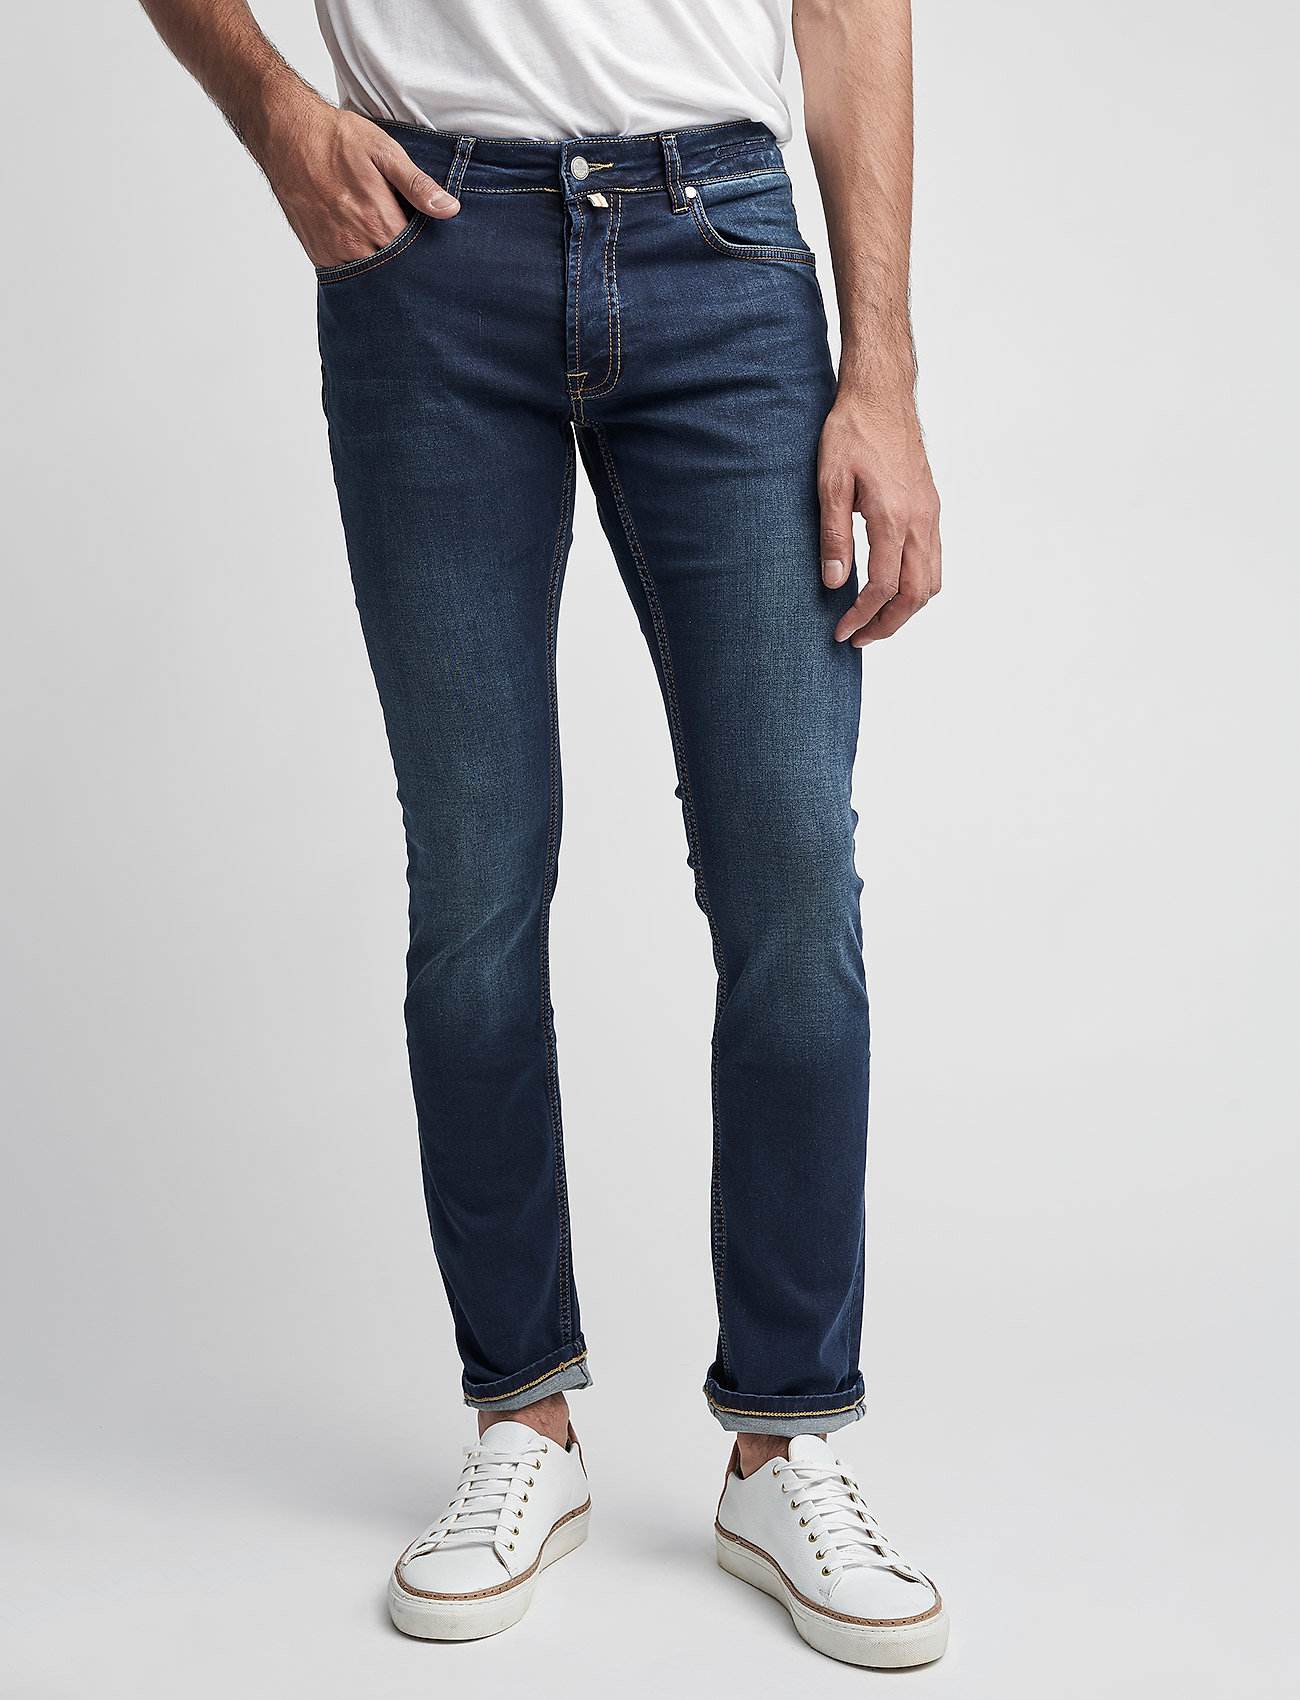 Morris - Steve Satin Jeans - skinny jeans - dk wash - 0